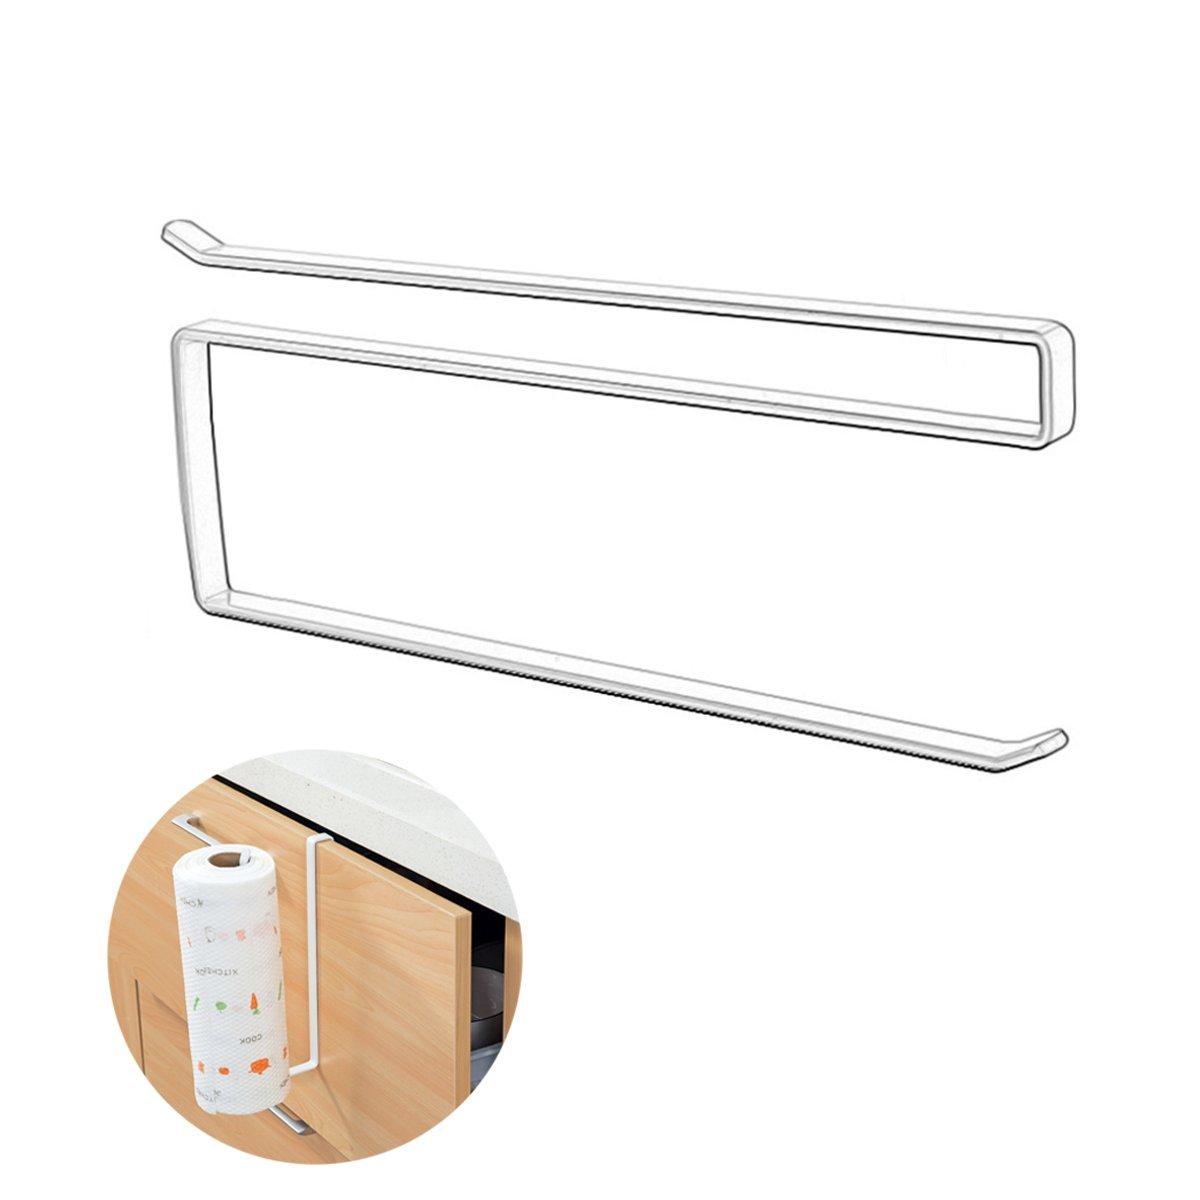 MARCHONE Kitchen Versatile Paper Towel Hanger Holder Under Cabinet by MARCHONE (Image #1)